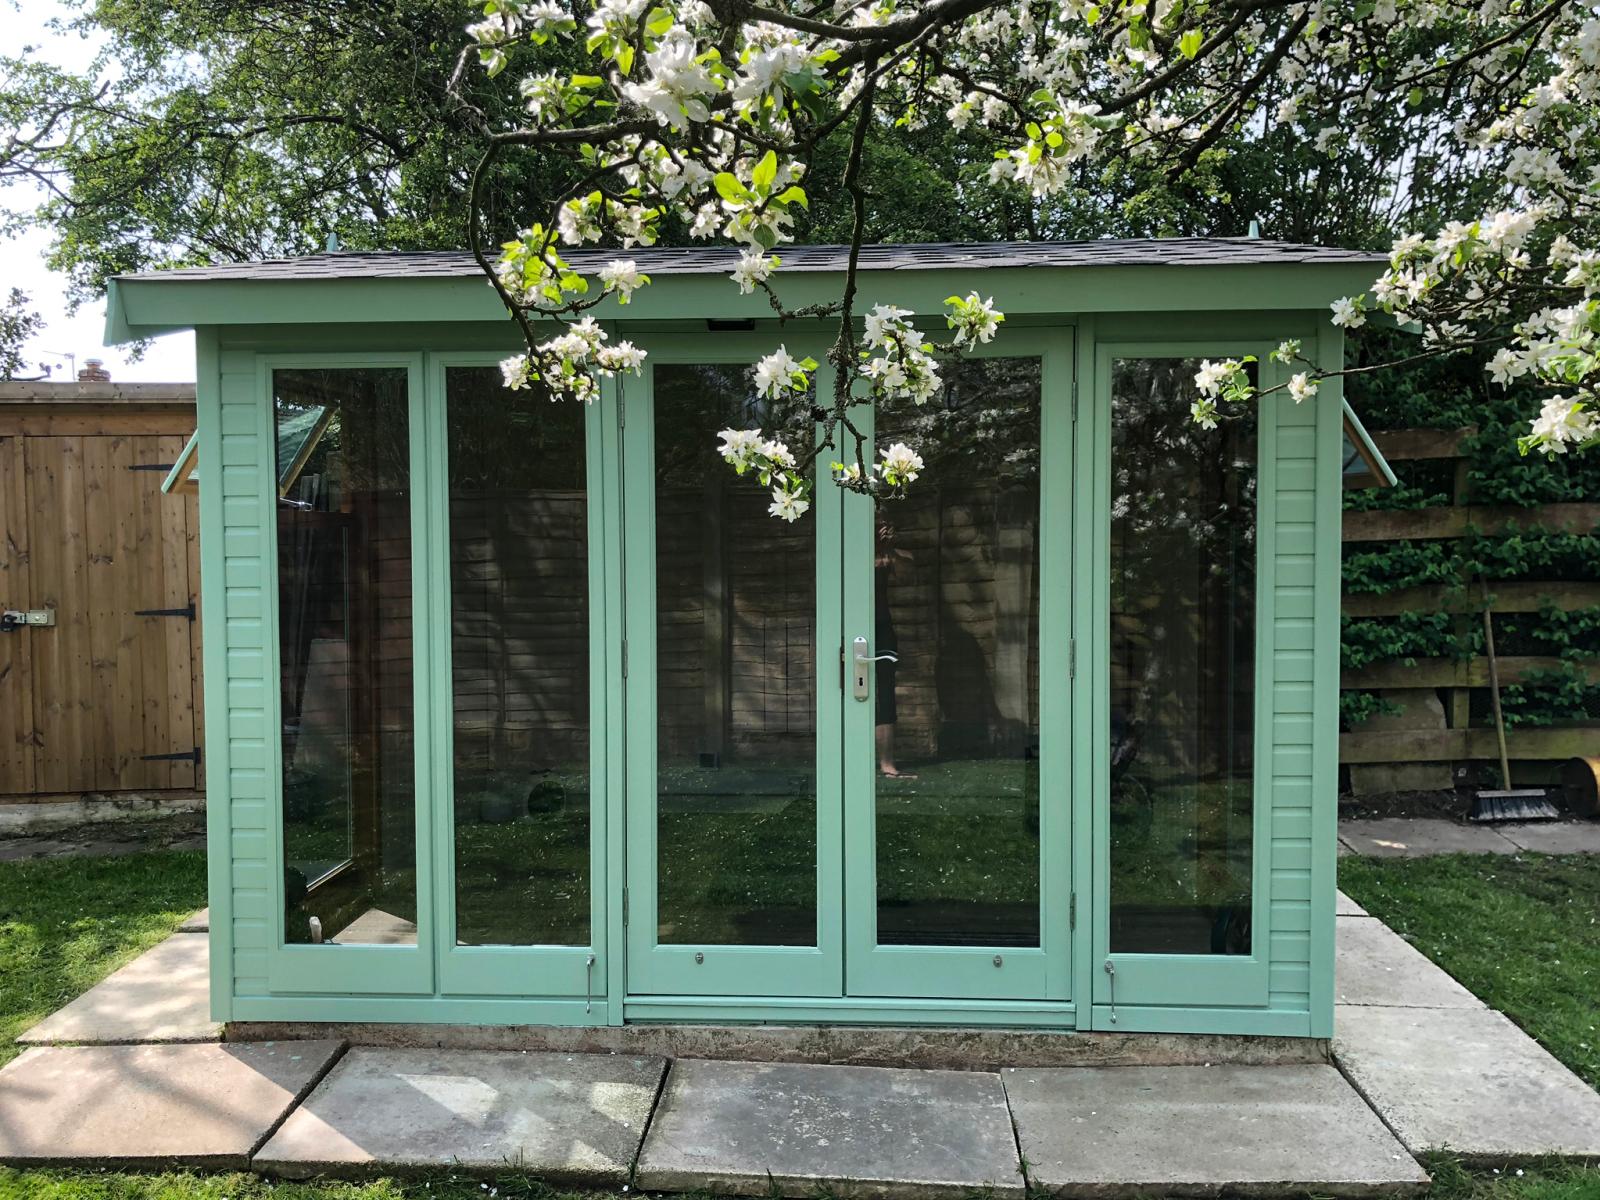 Garden Living Range - Sienna Pavilion